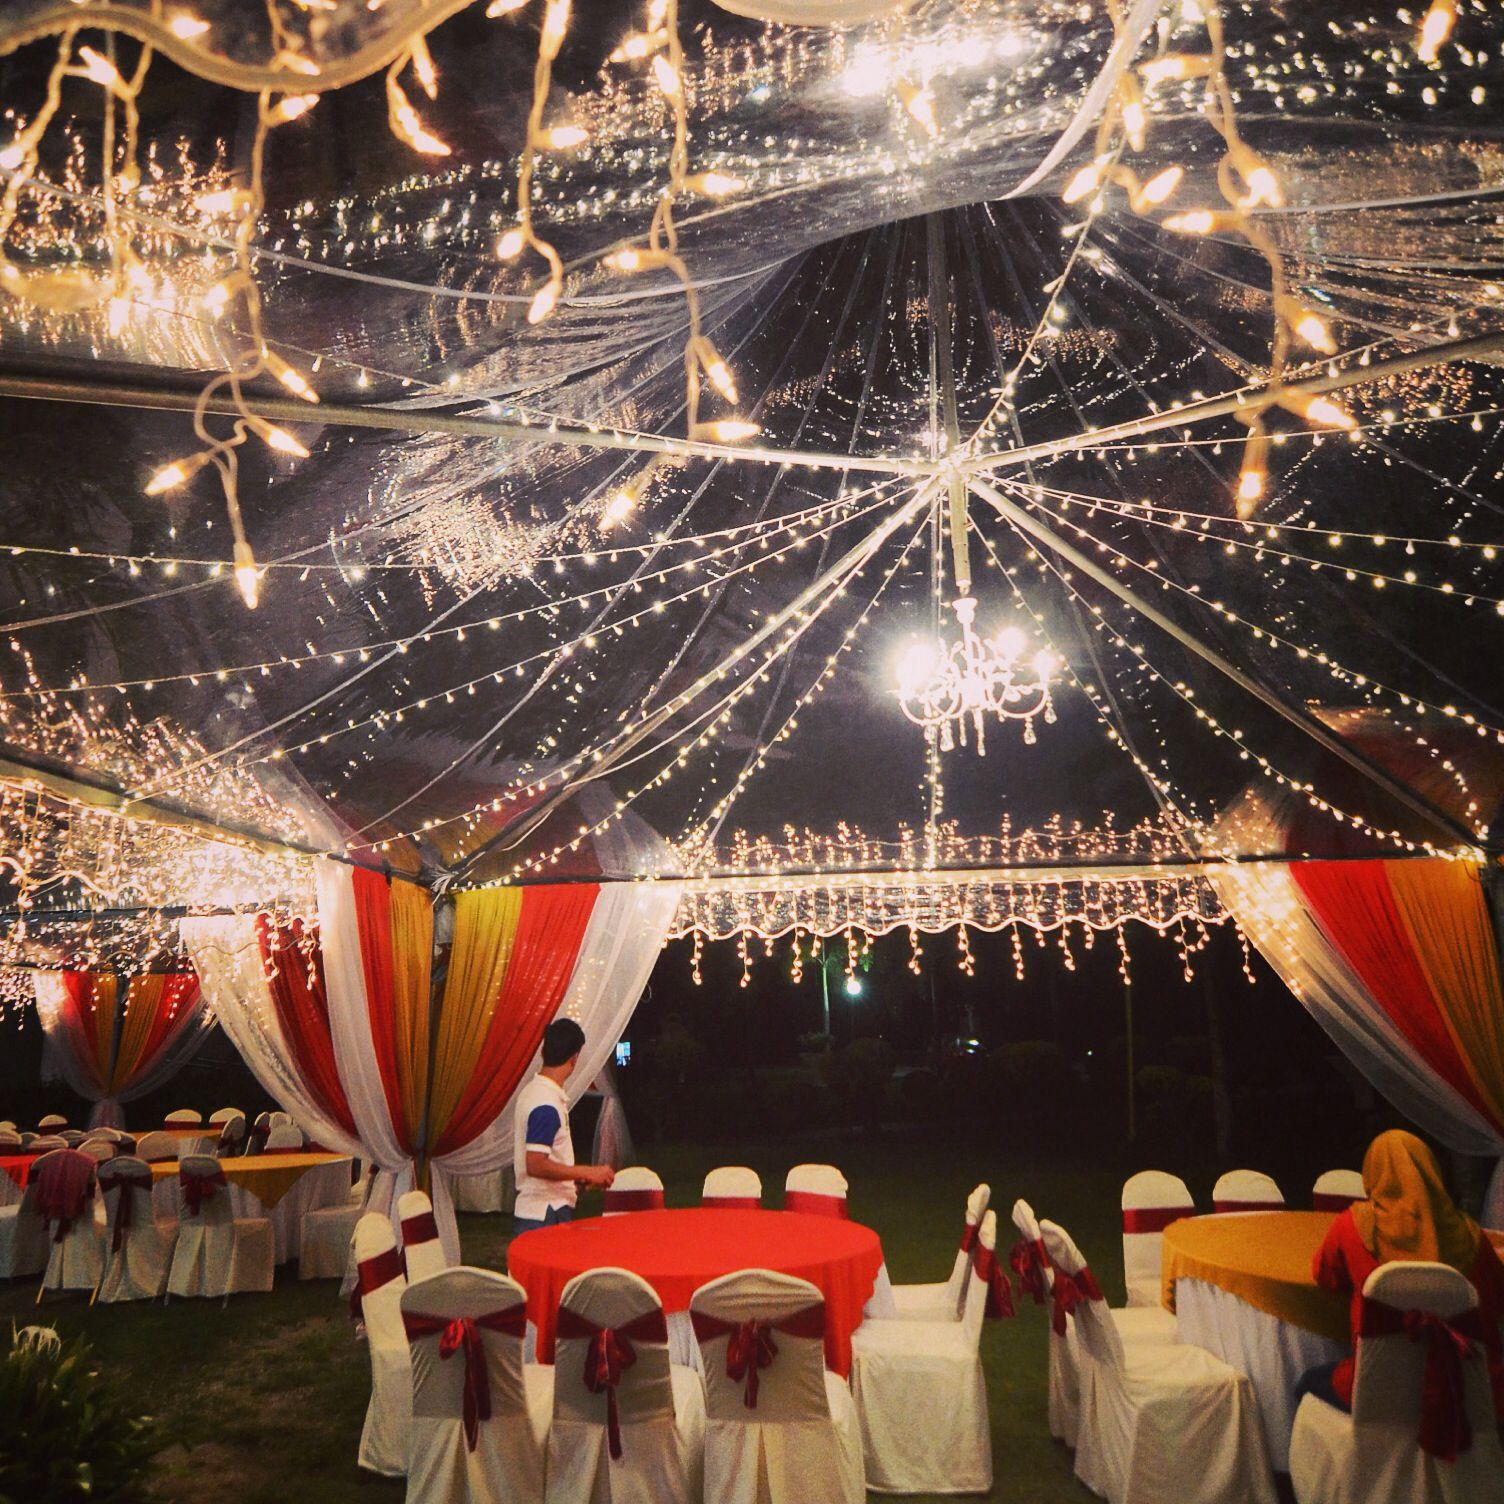 Transparent Canopy Fairylights Deco Tent Decorations Dream Wedding Wedding